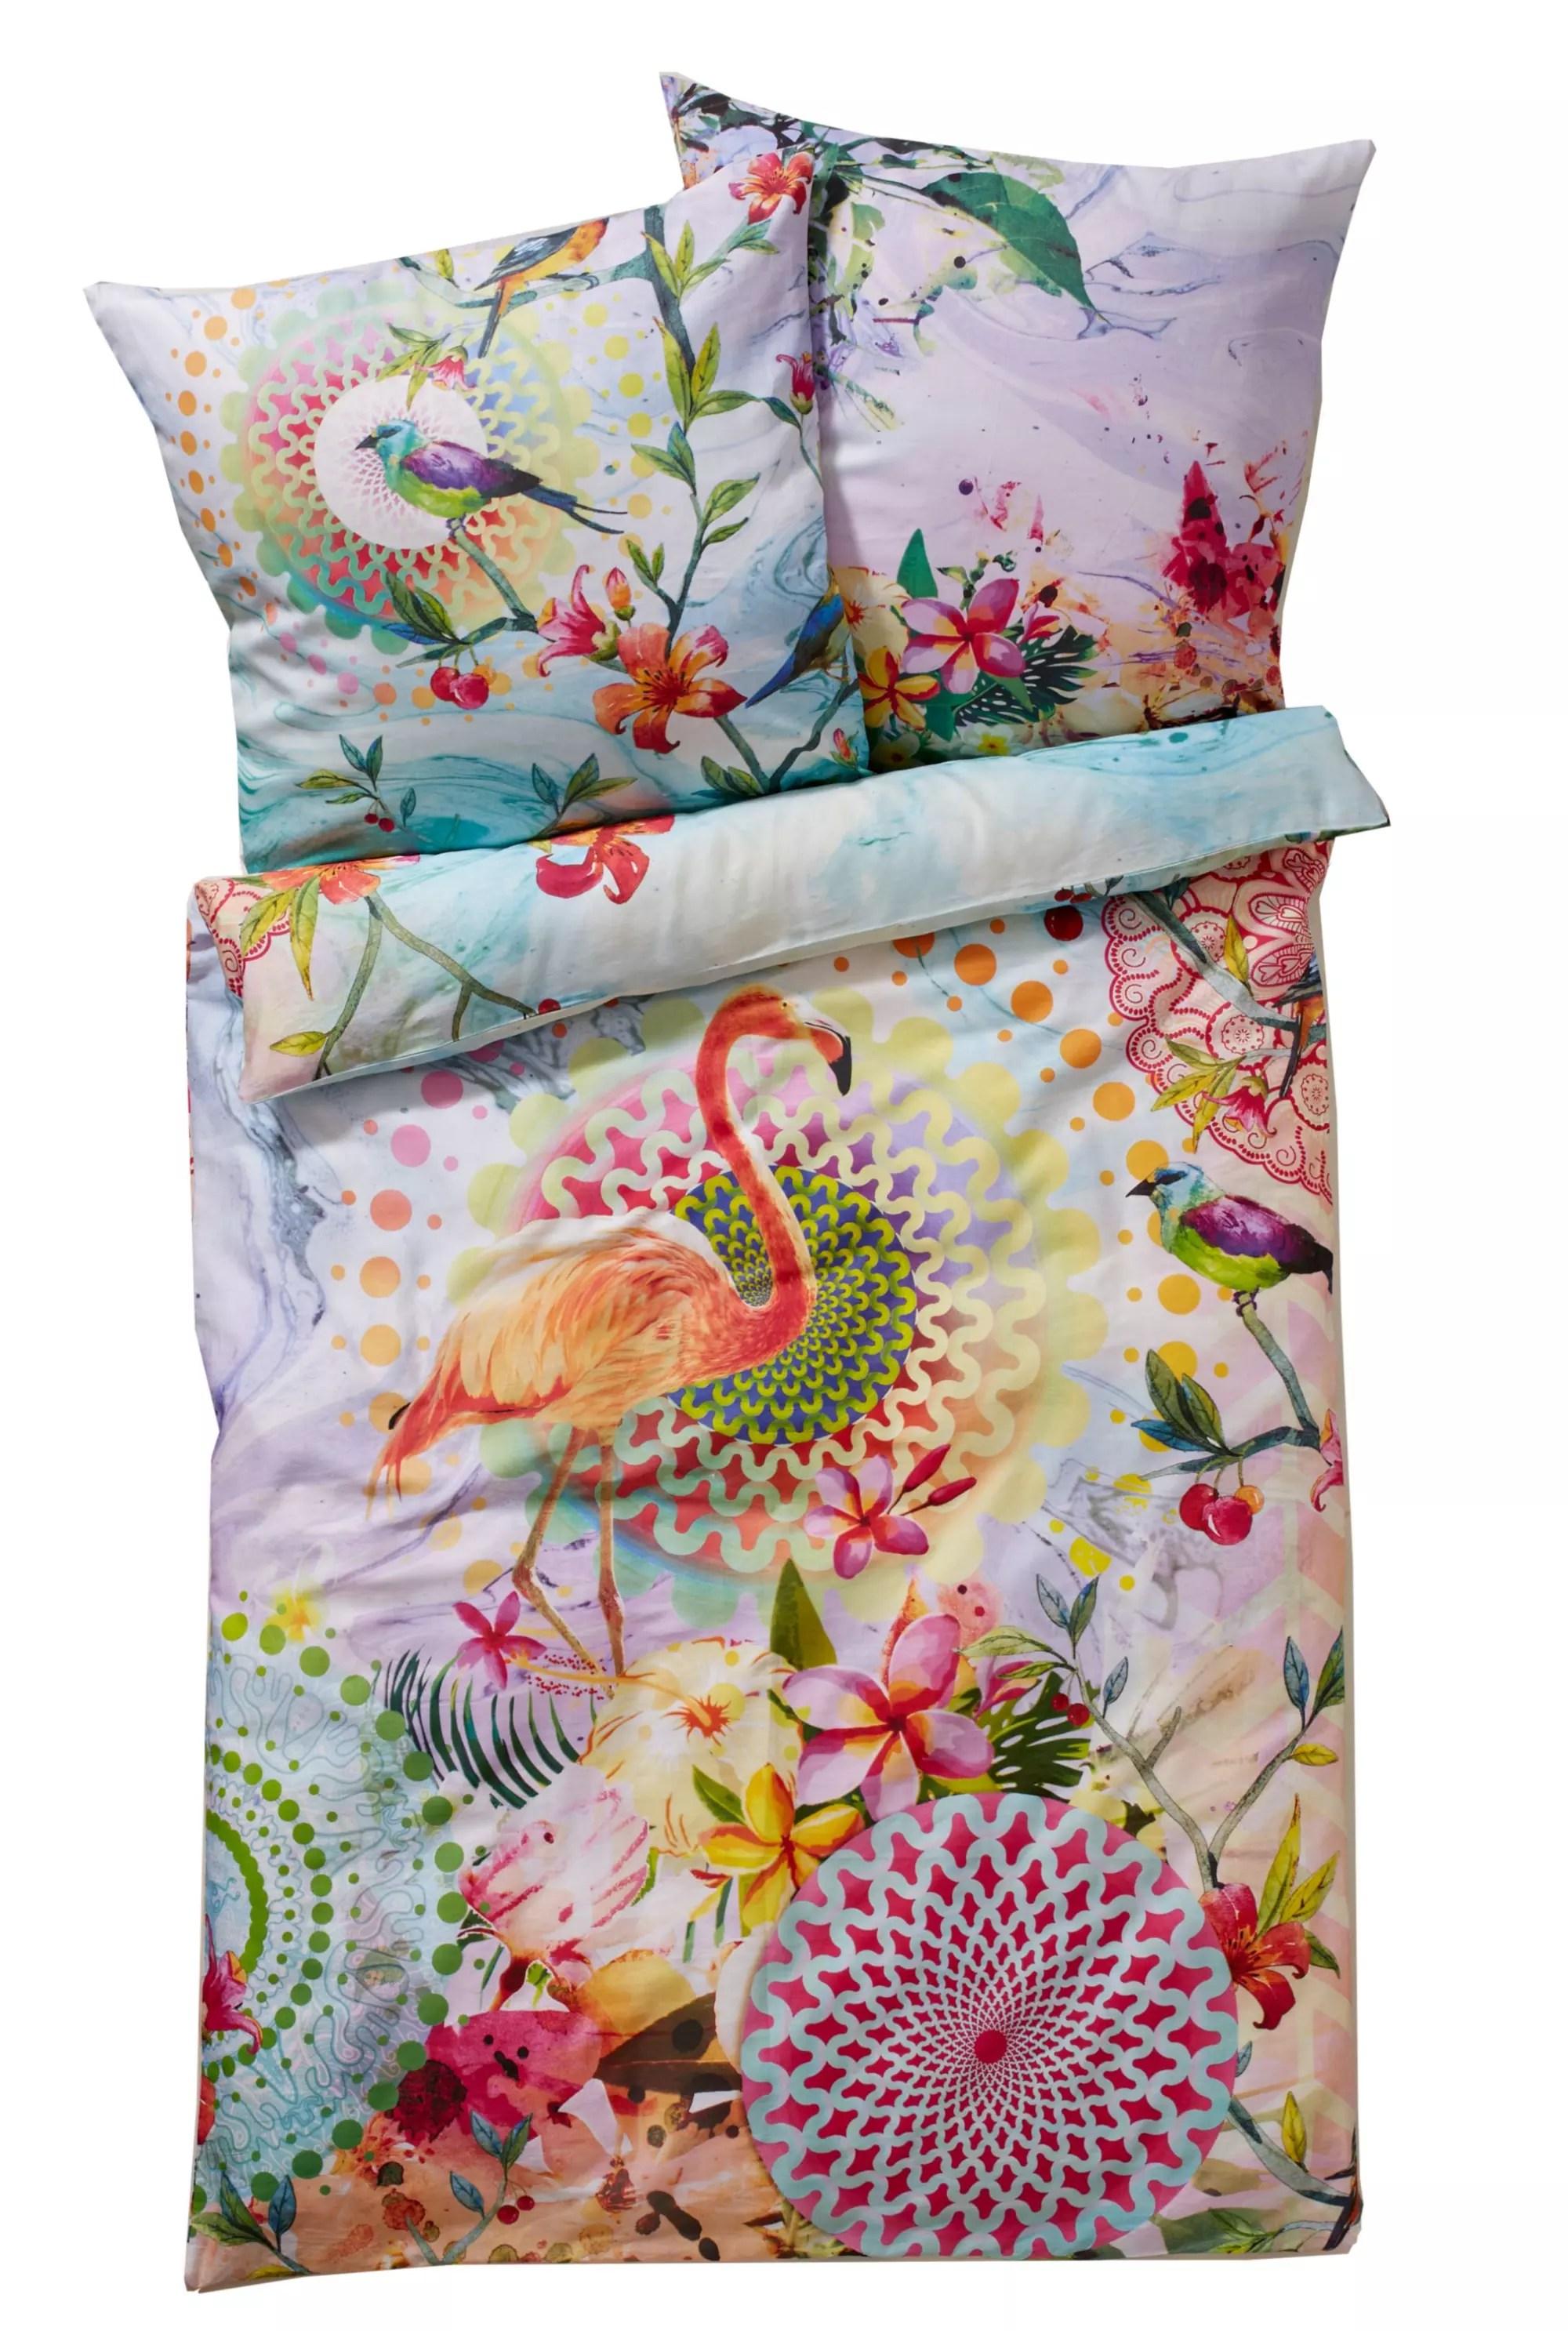 Lidl Bettwäsche Flamingo Kopfkissen Lidl Bettdecken Druck Baby